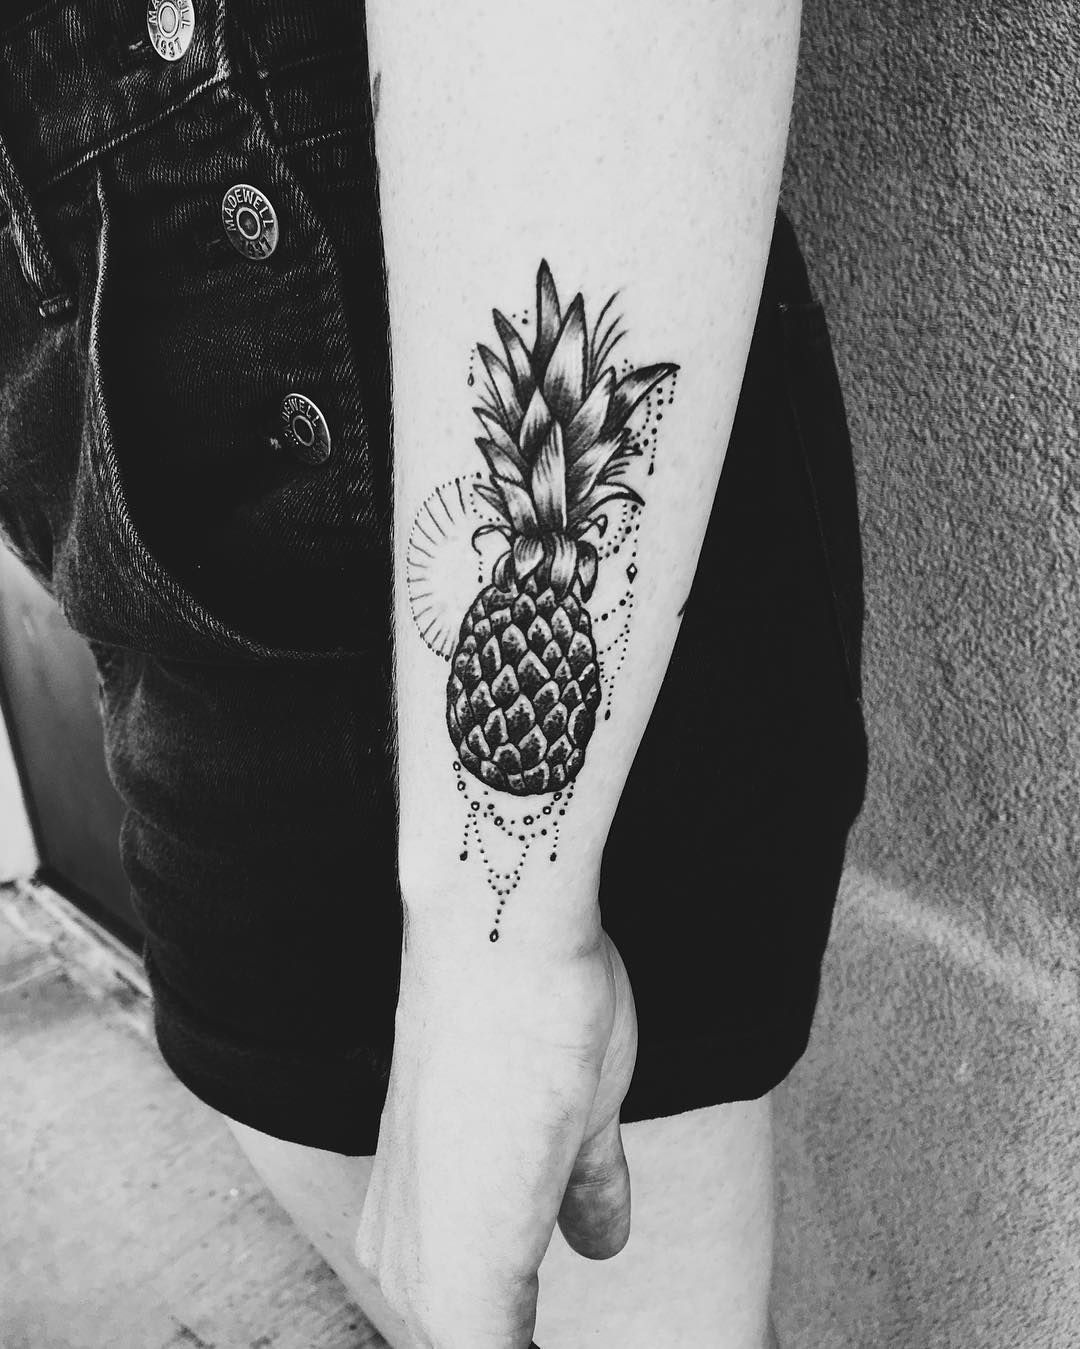 Maui pineapple tattoo tattoos pinterest pineapple for Henna tattoo maui